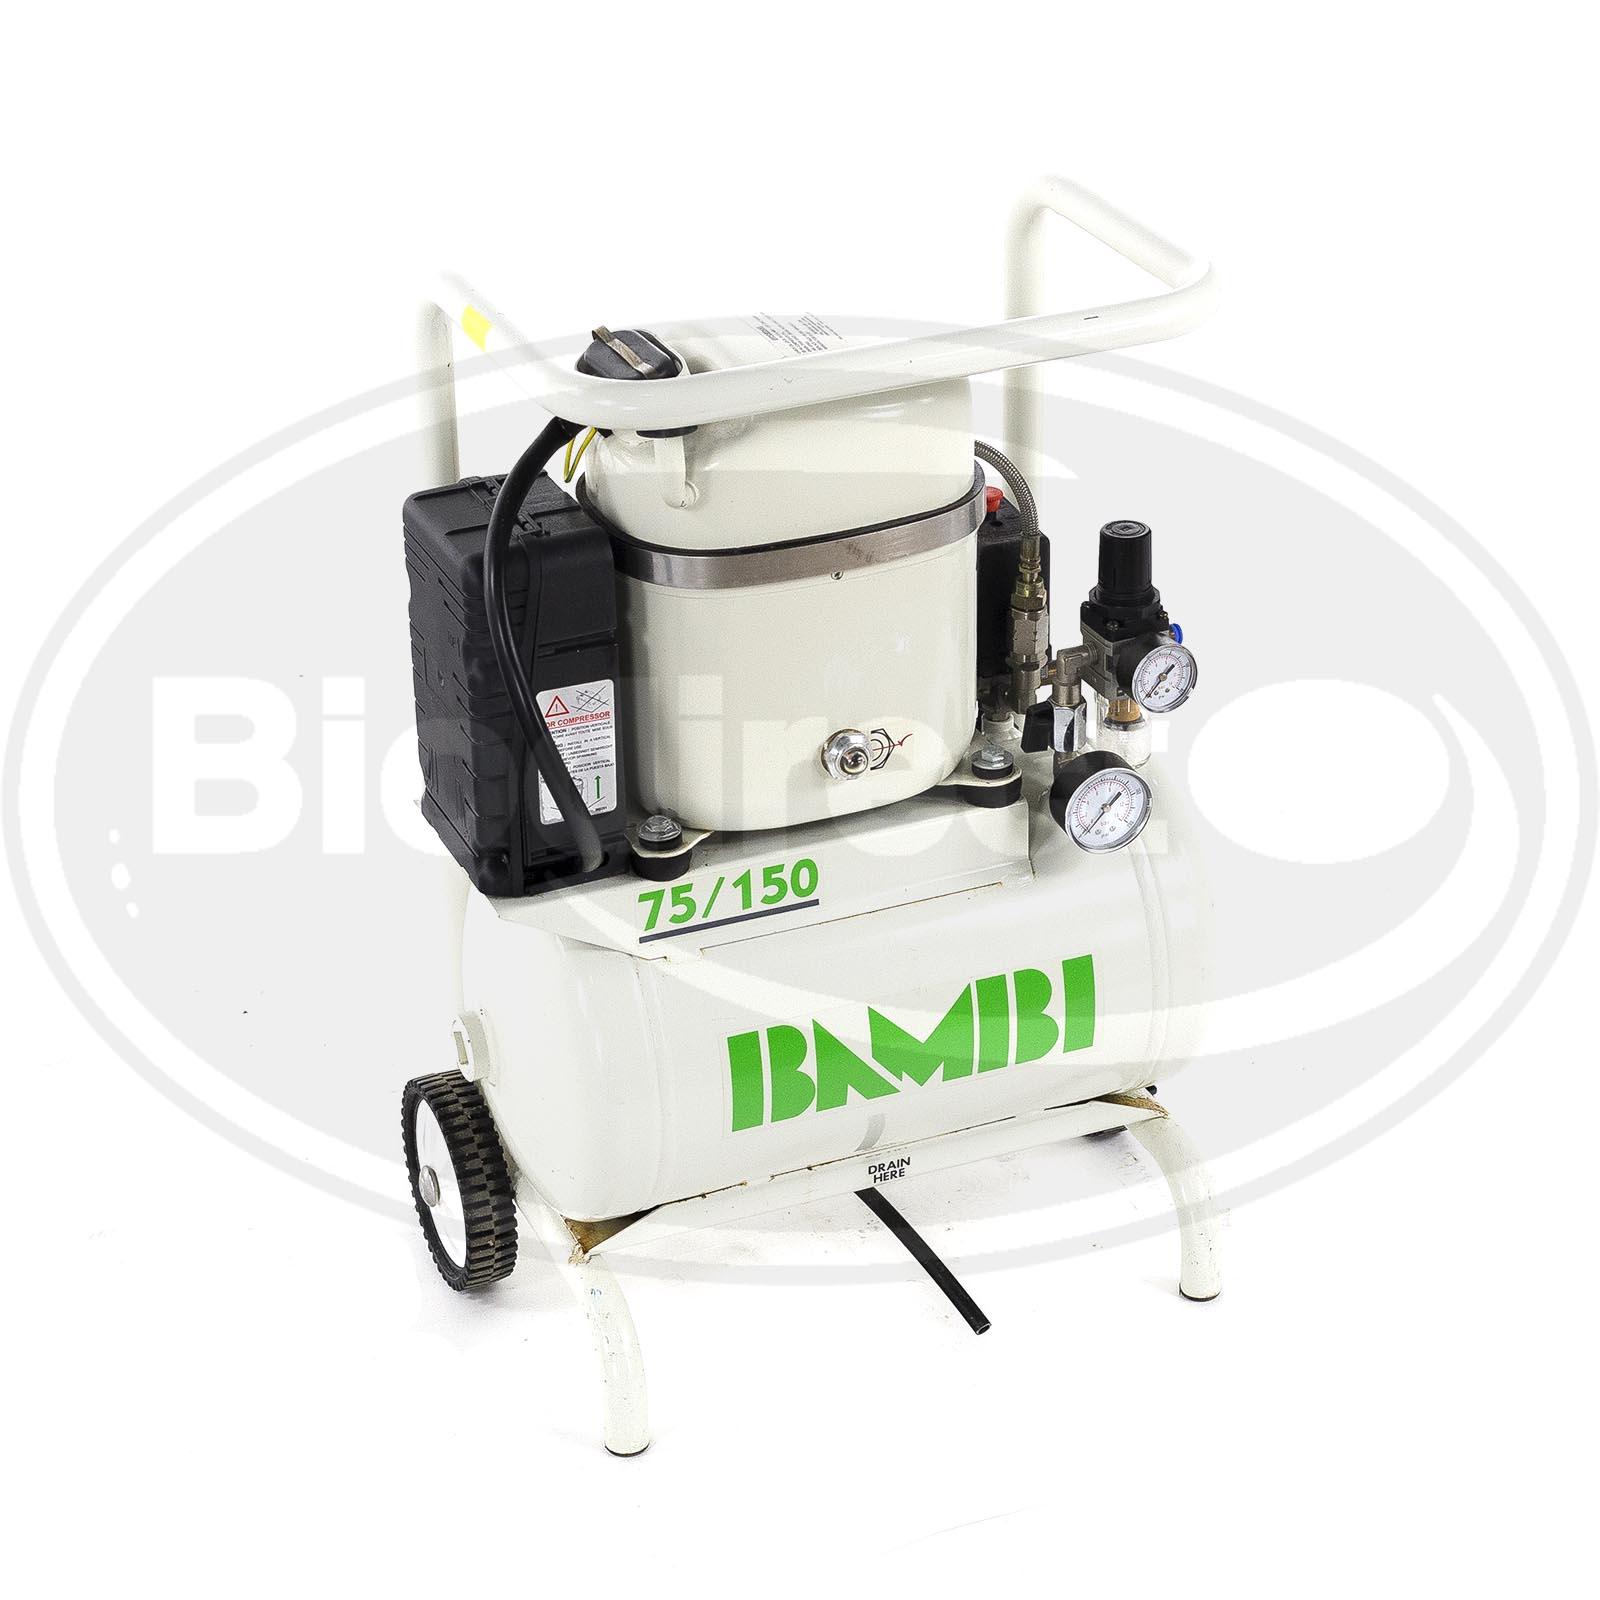 Used Bambi Pumpair Compressor Md75 150 For Sale Biodirect Usa Compact Powder